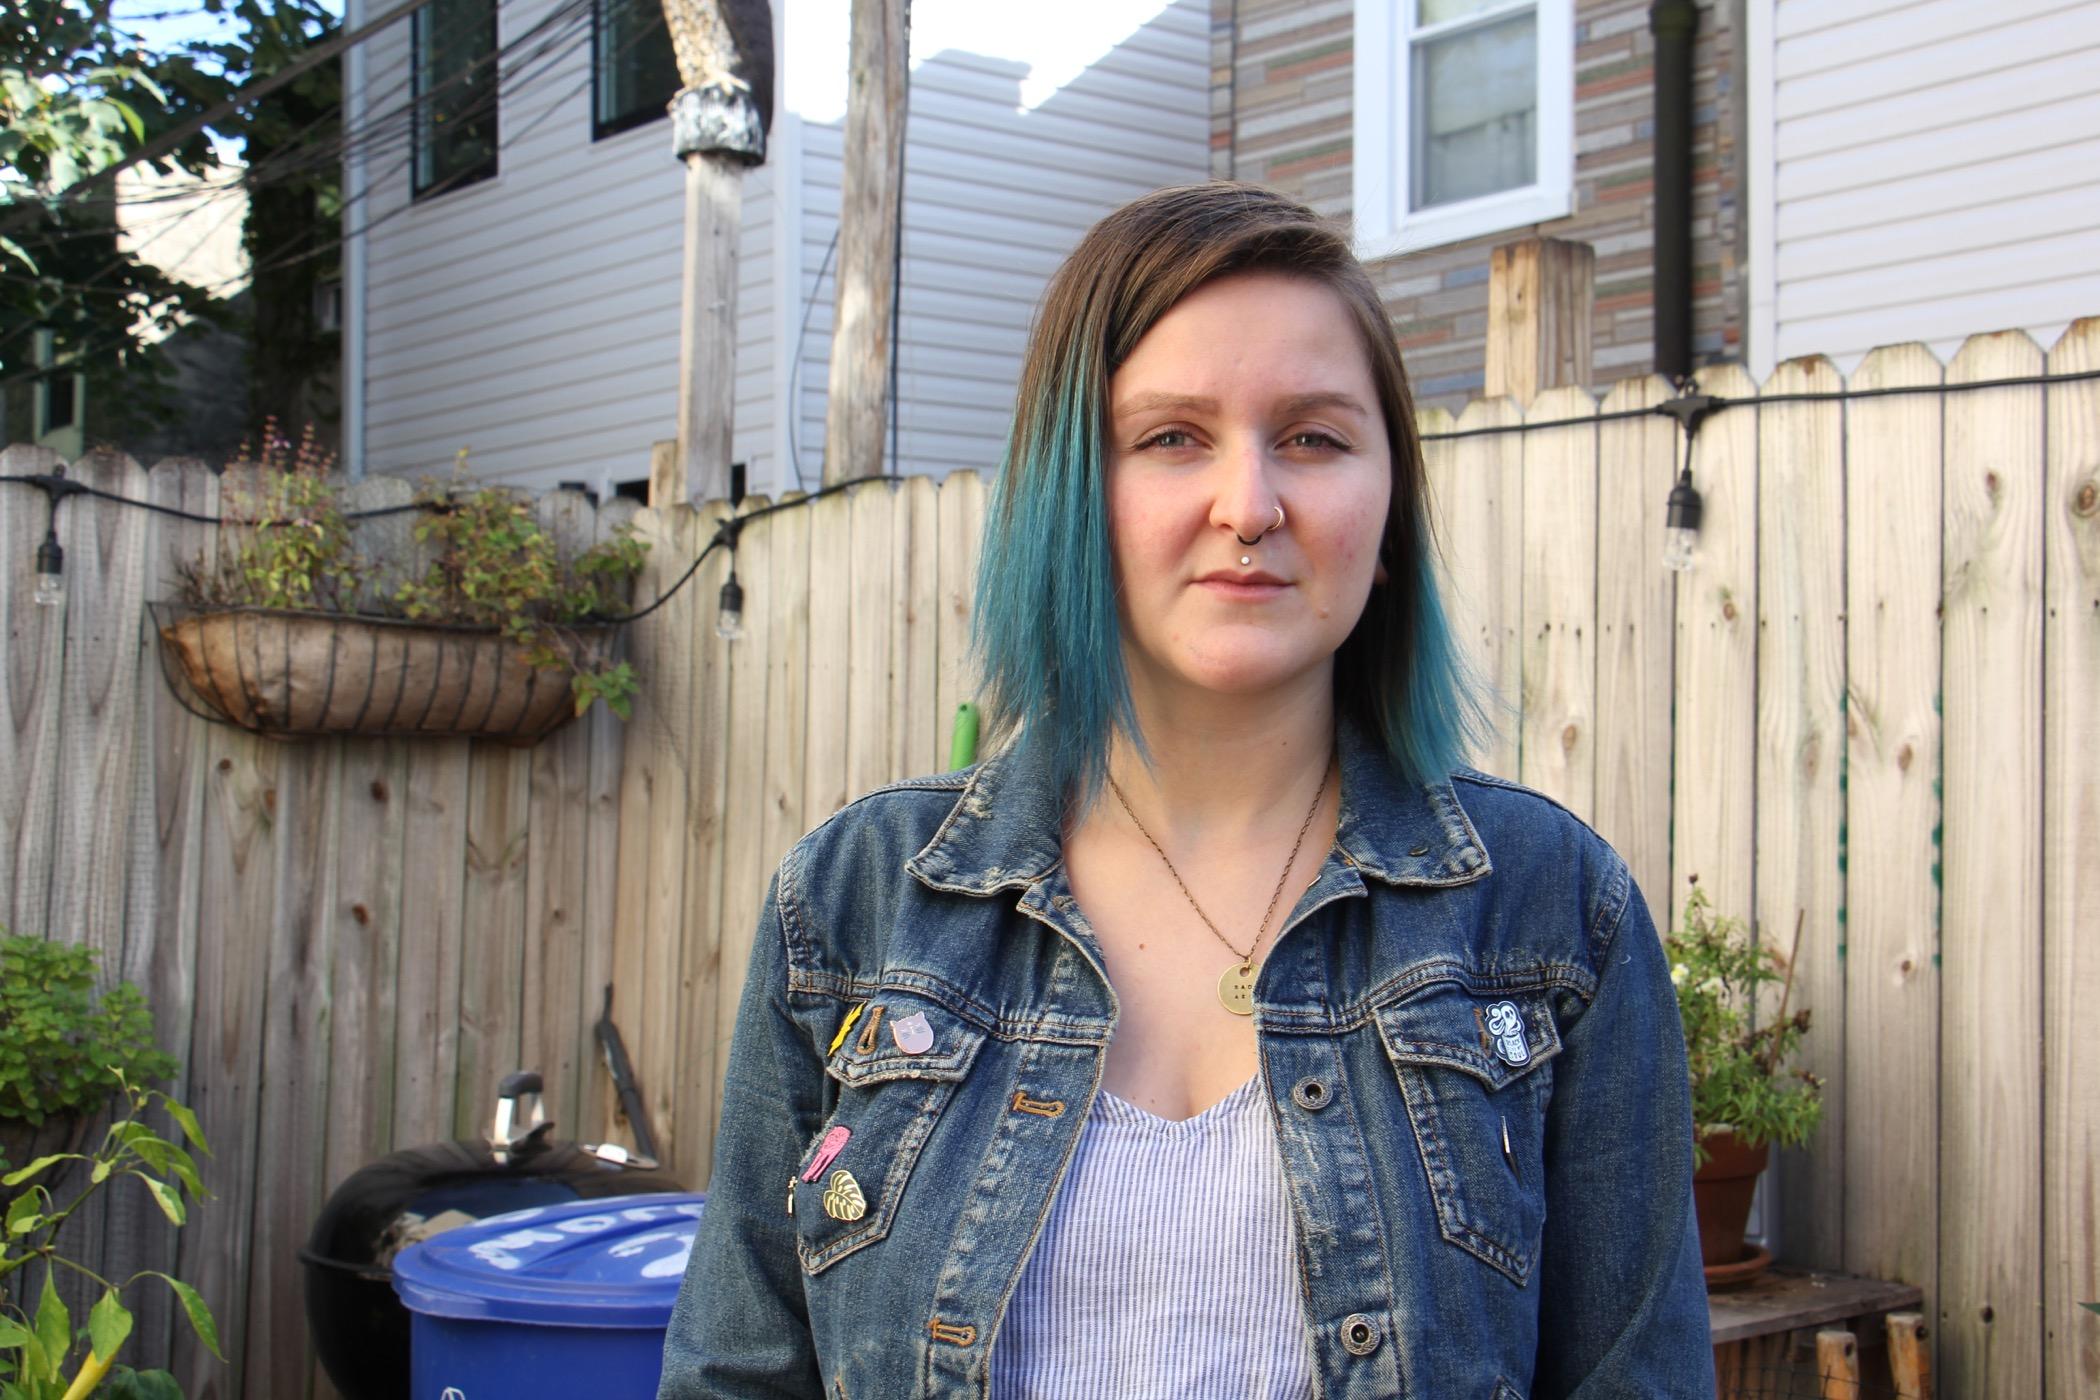 Melissa Durko outside her South Philadelphia rowhouse